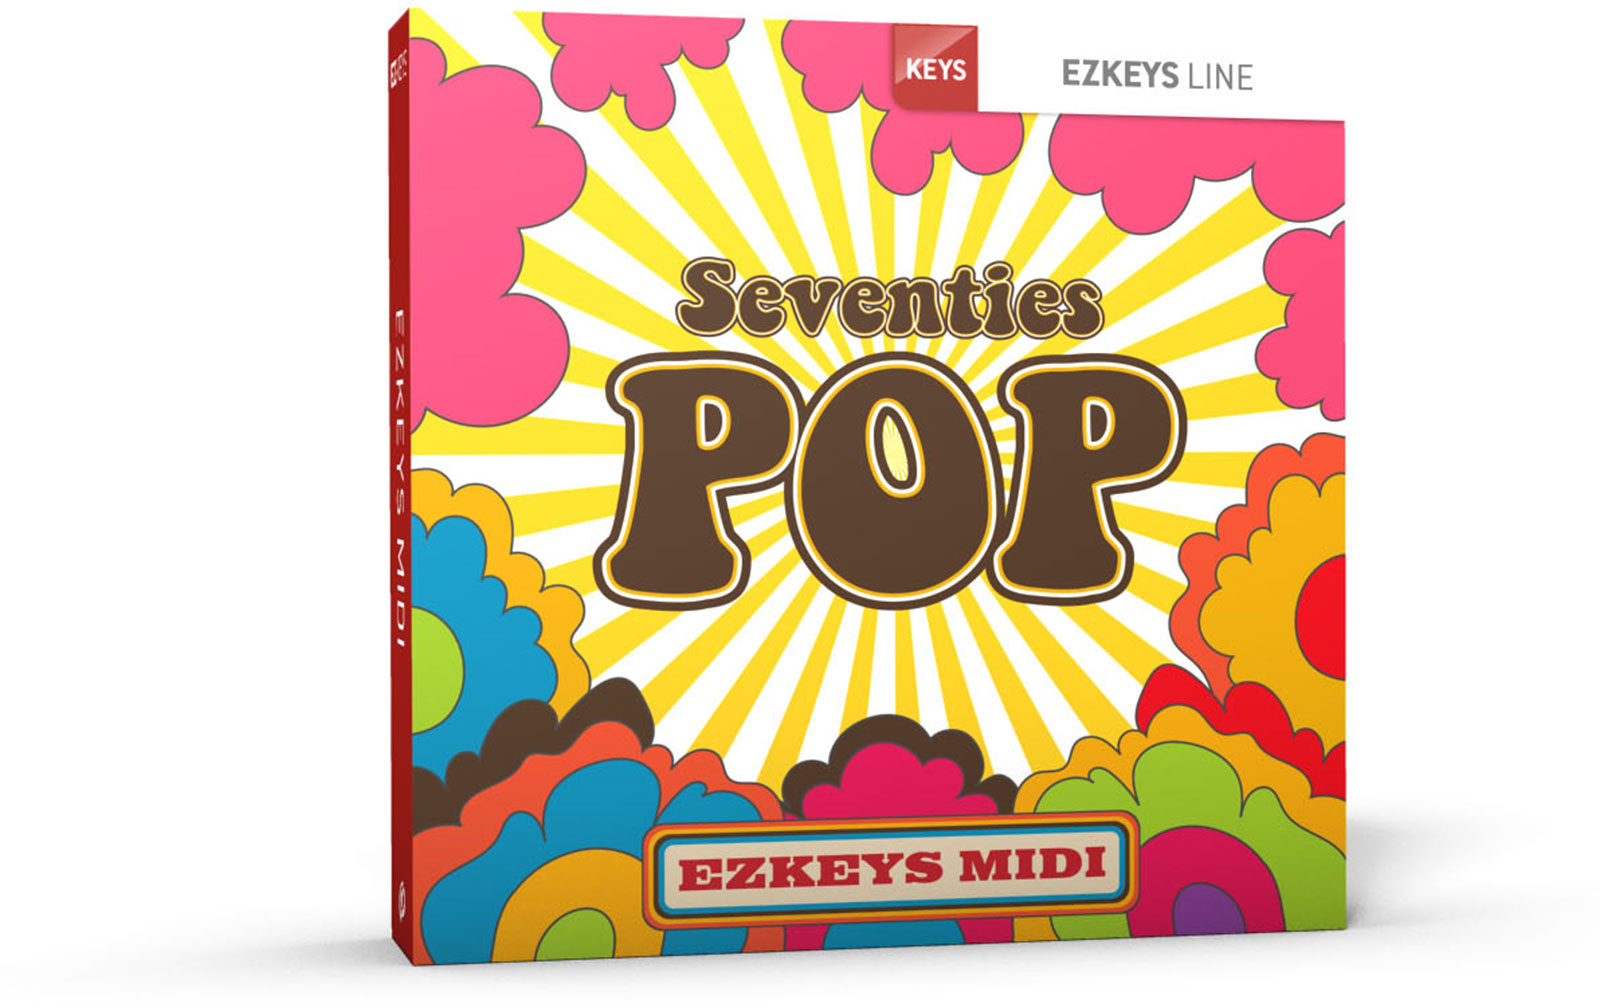 toontrack-ezkeys-seventies-pop-midi-pack-download-